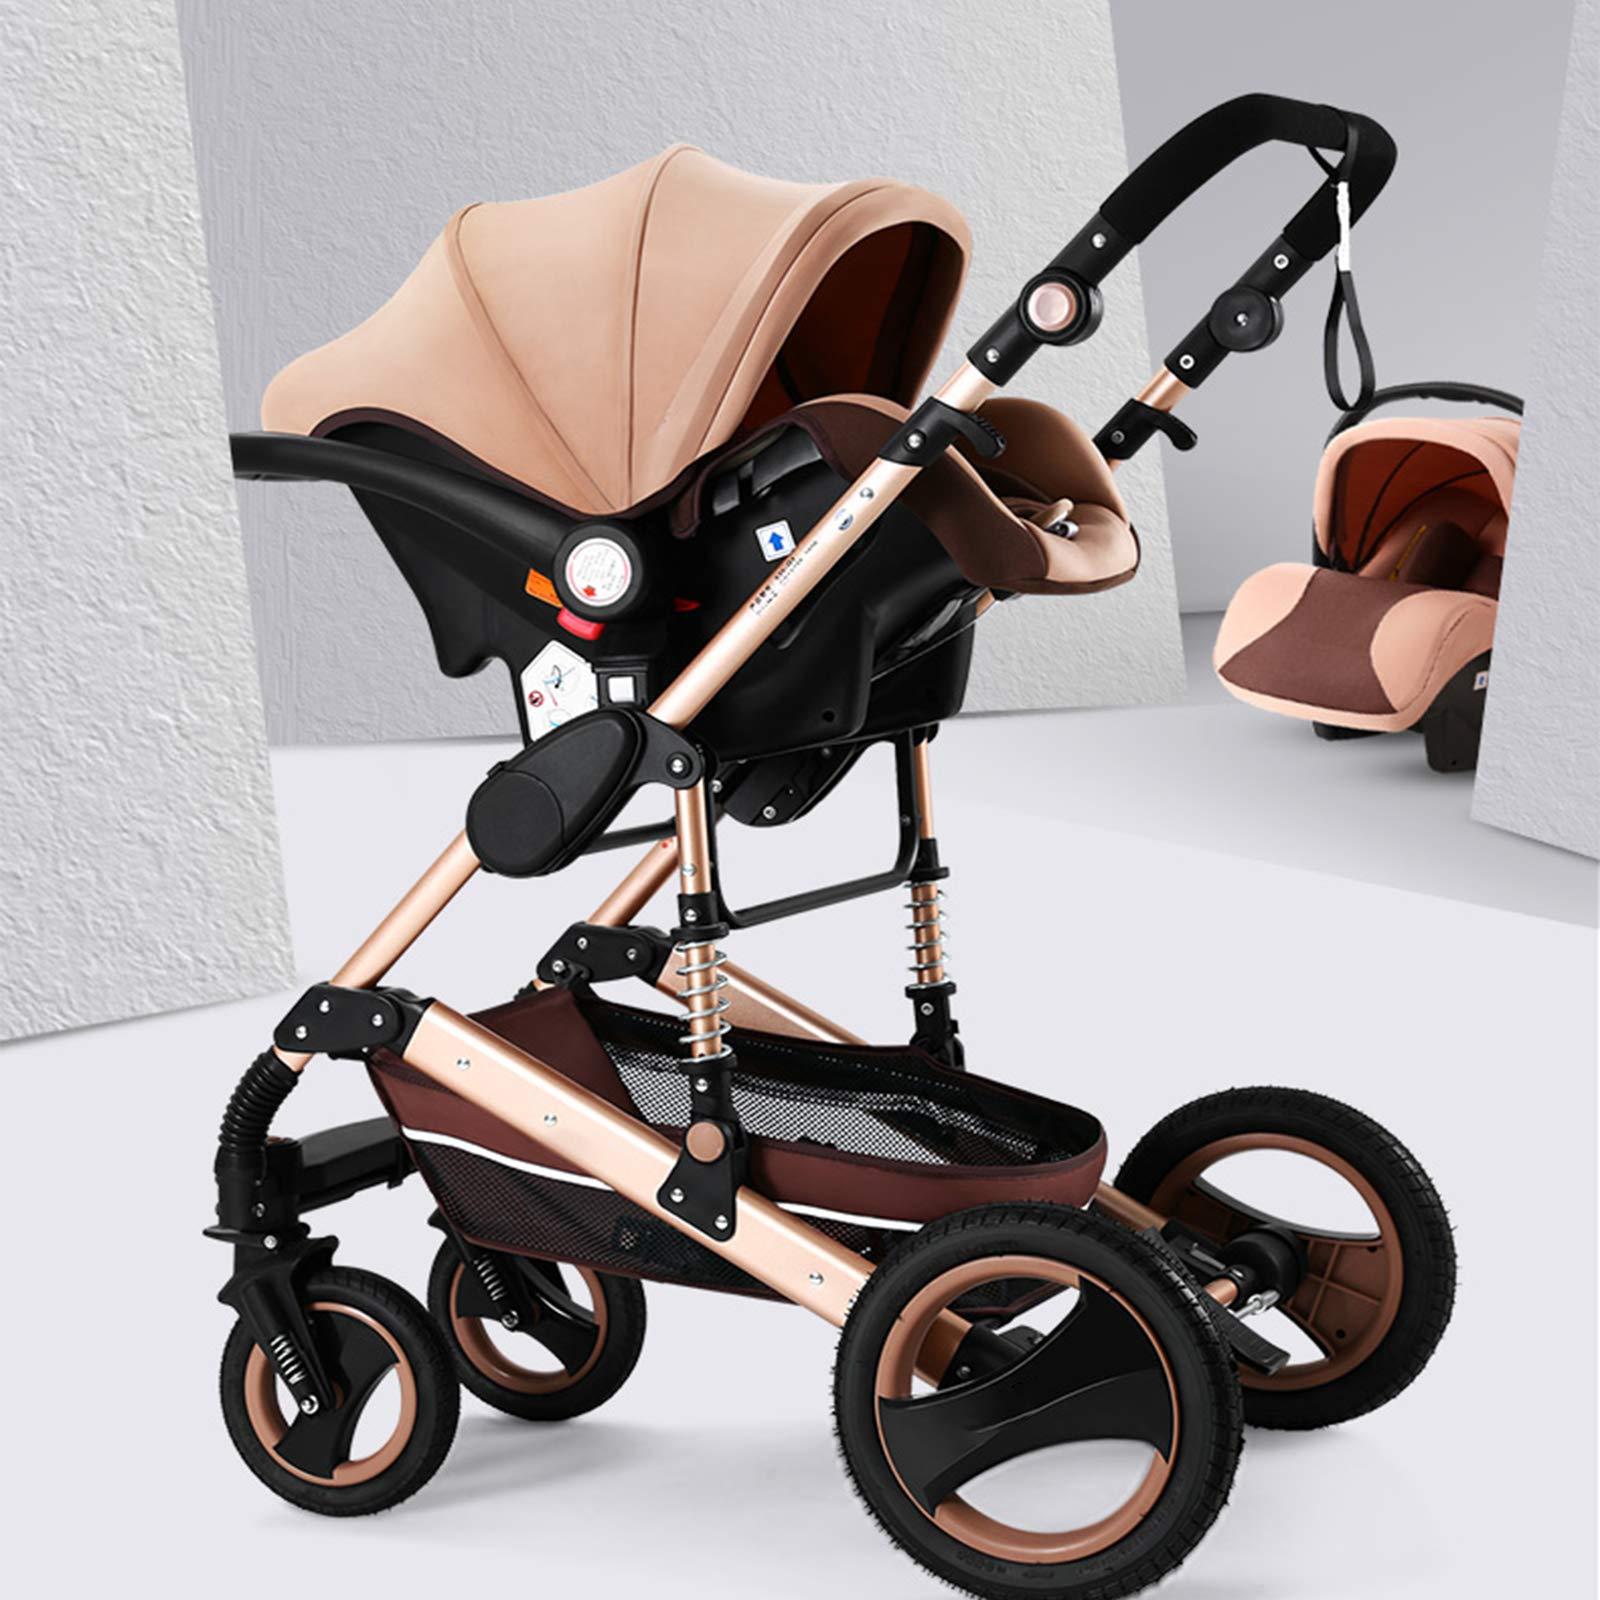 Happybuy 3 in 1 Foldable Luxury Baby Stroller Travel System with Baby Basket Anti-Shock Springs Newborn Baby Pushchair Adjustable High View Pram Travel System Infant Carriage Pushchair(3in1/Gold)